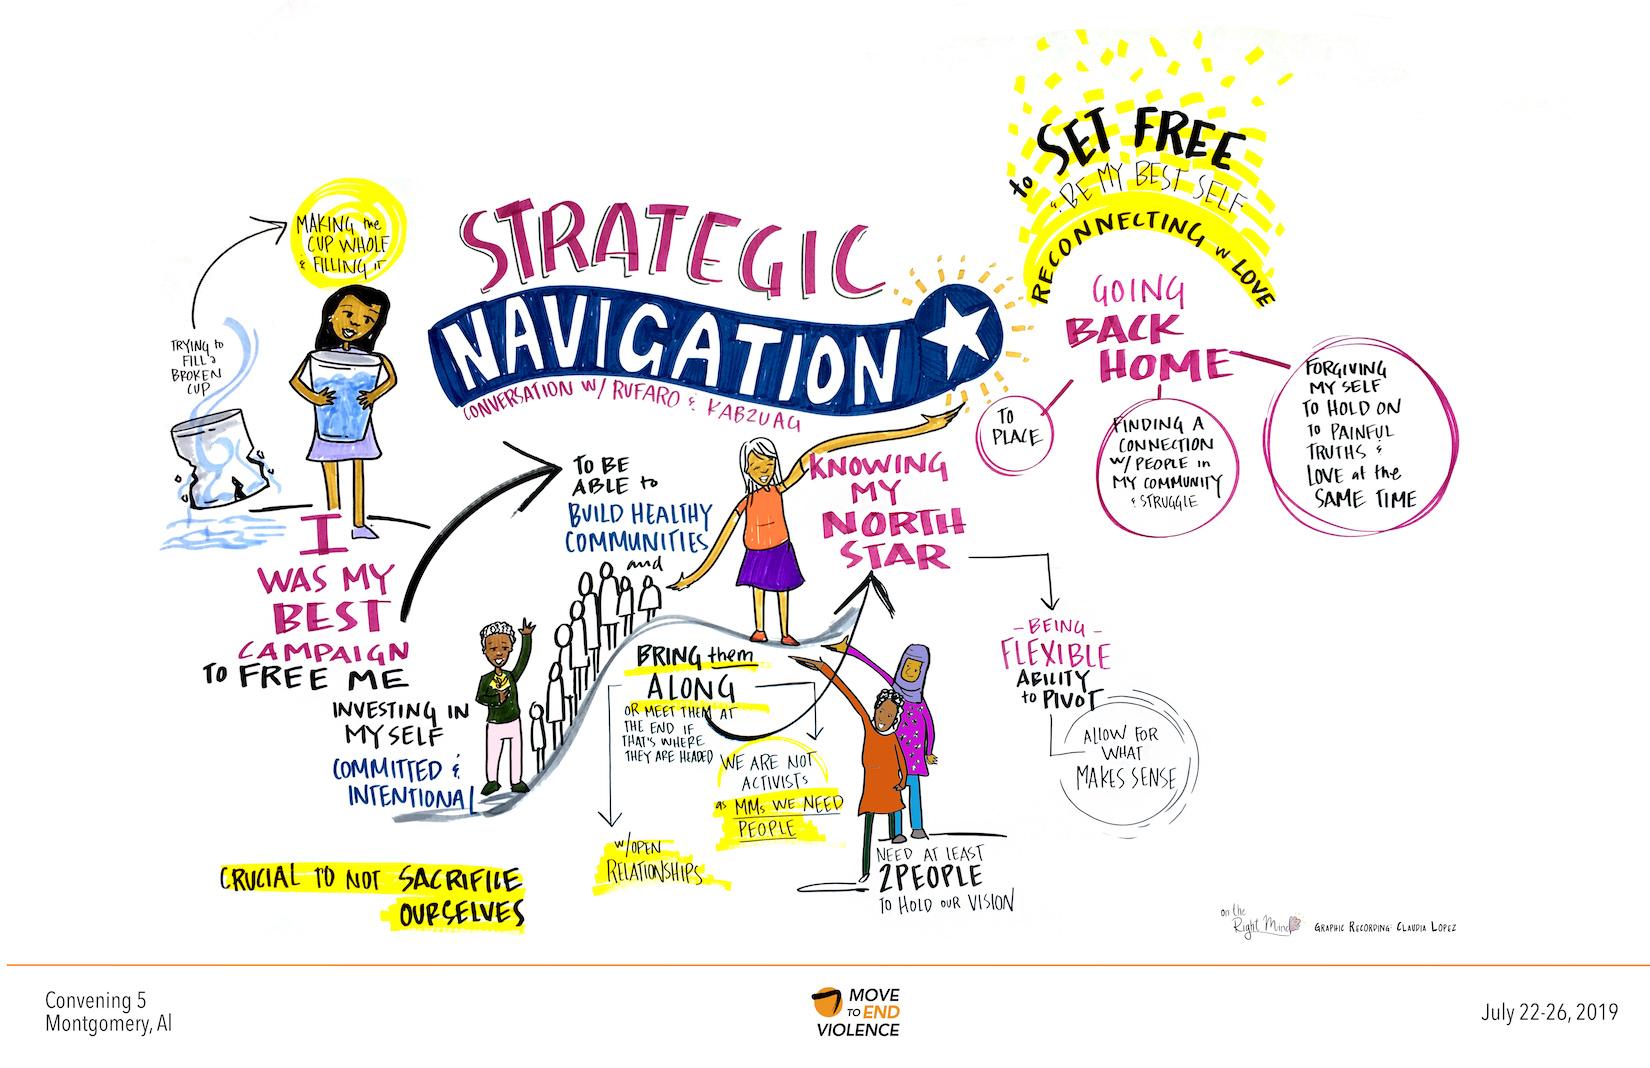 Strategic Navigation - Social Justice Movements